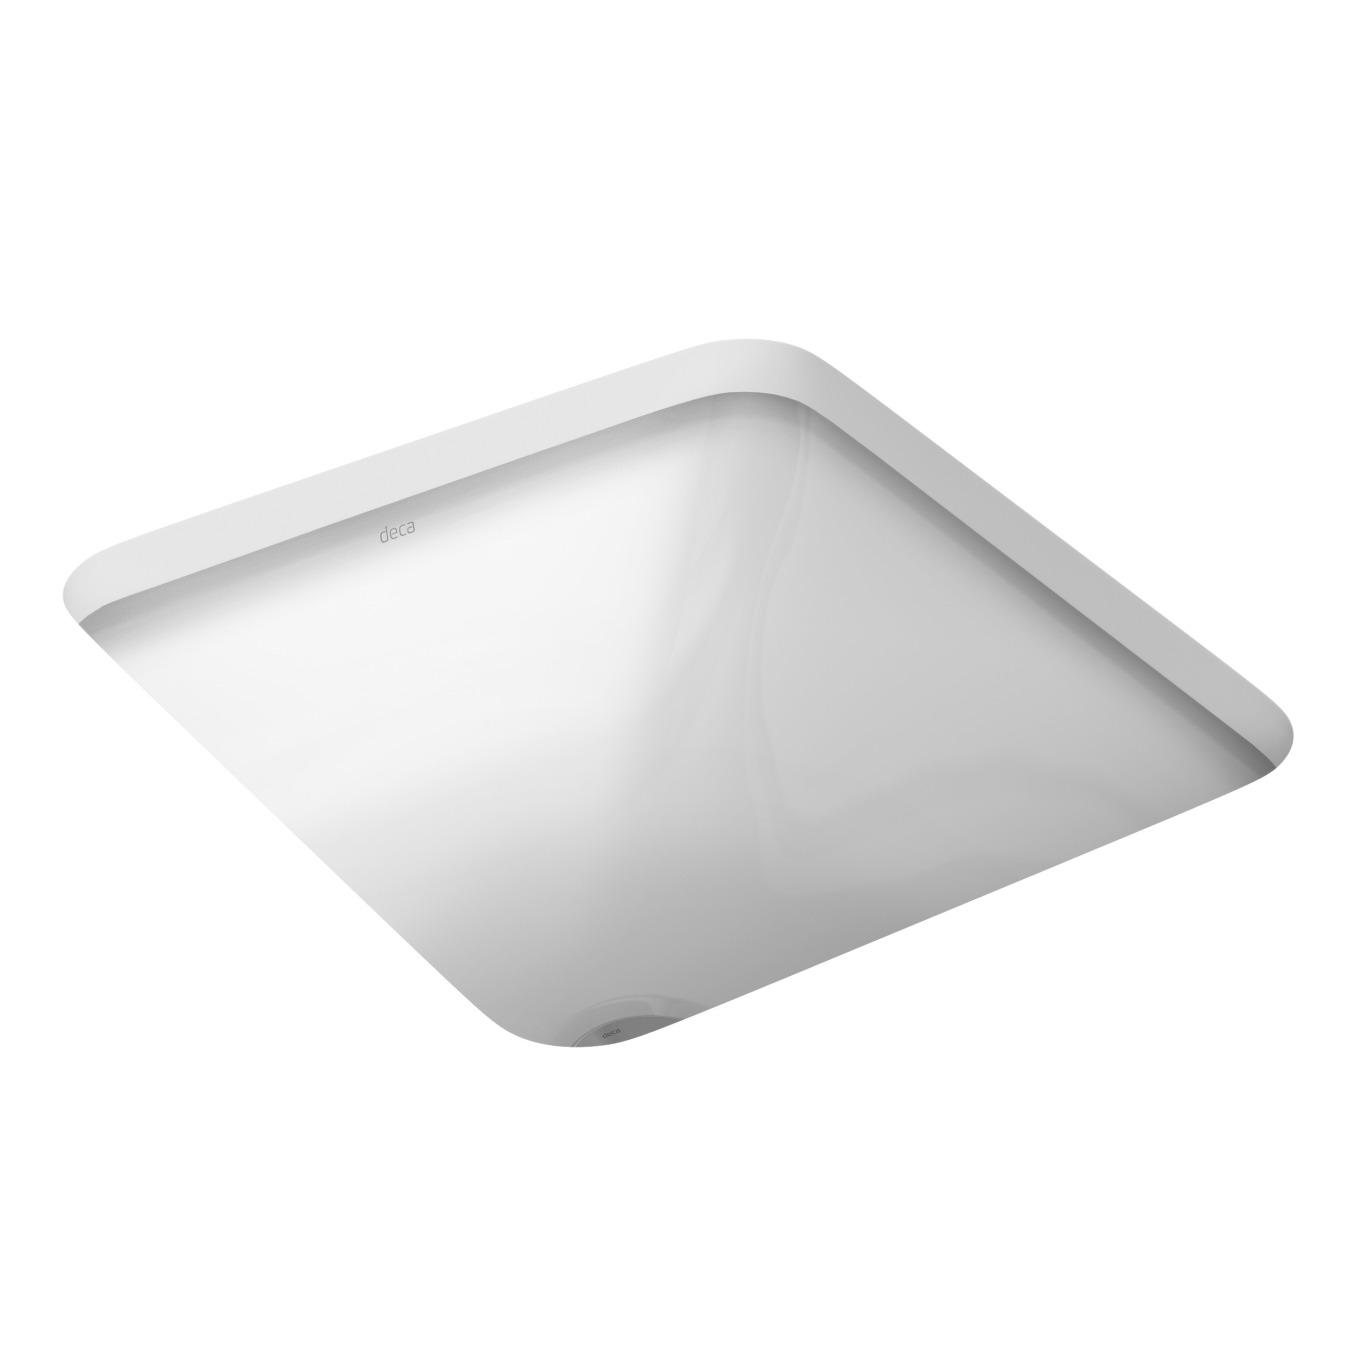 Cuba de Louca de Embutir Quadrado 35x35 cm Branco Gelo - L41517 Deca